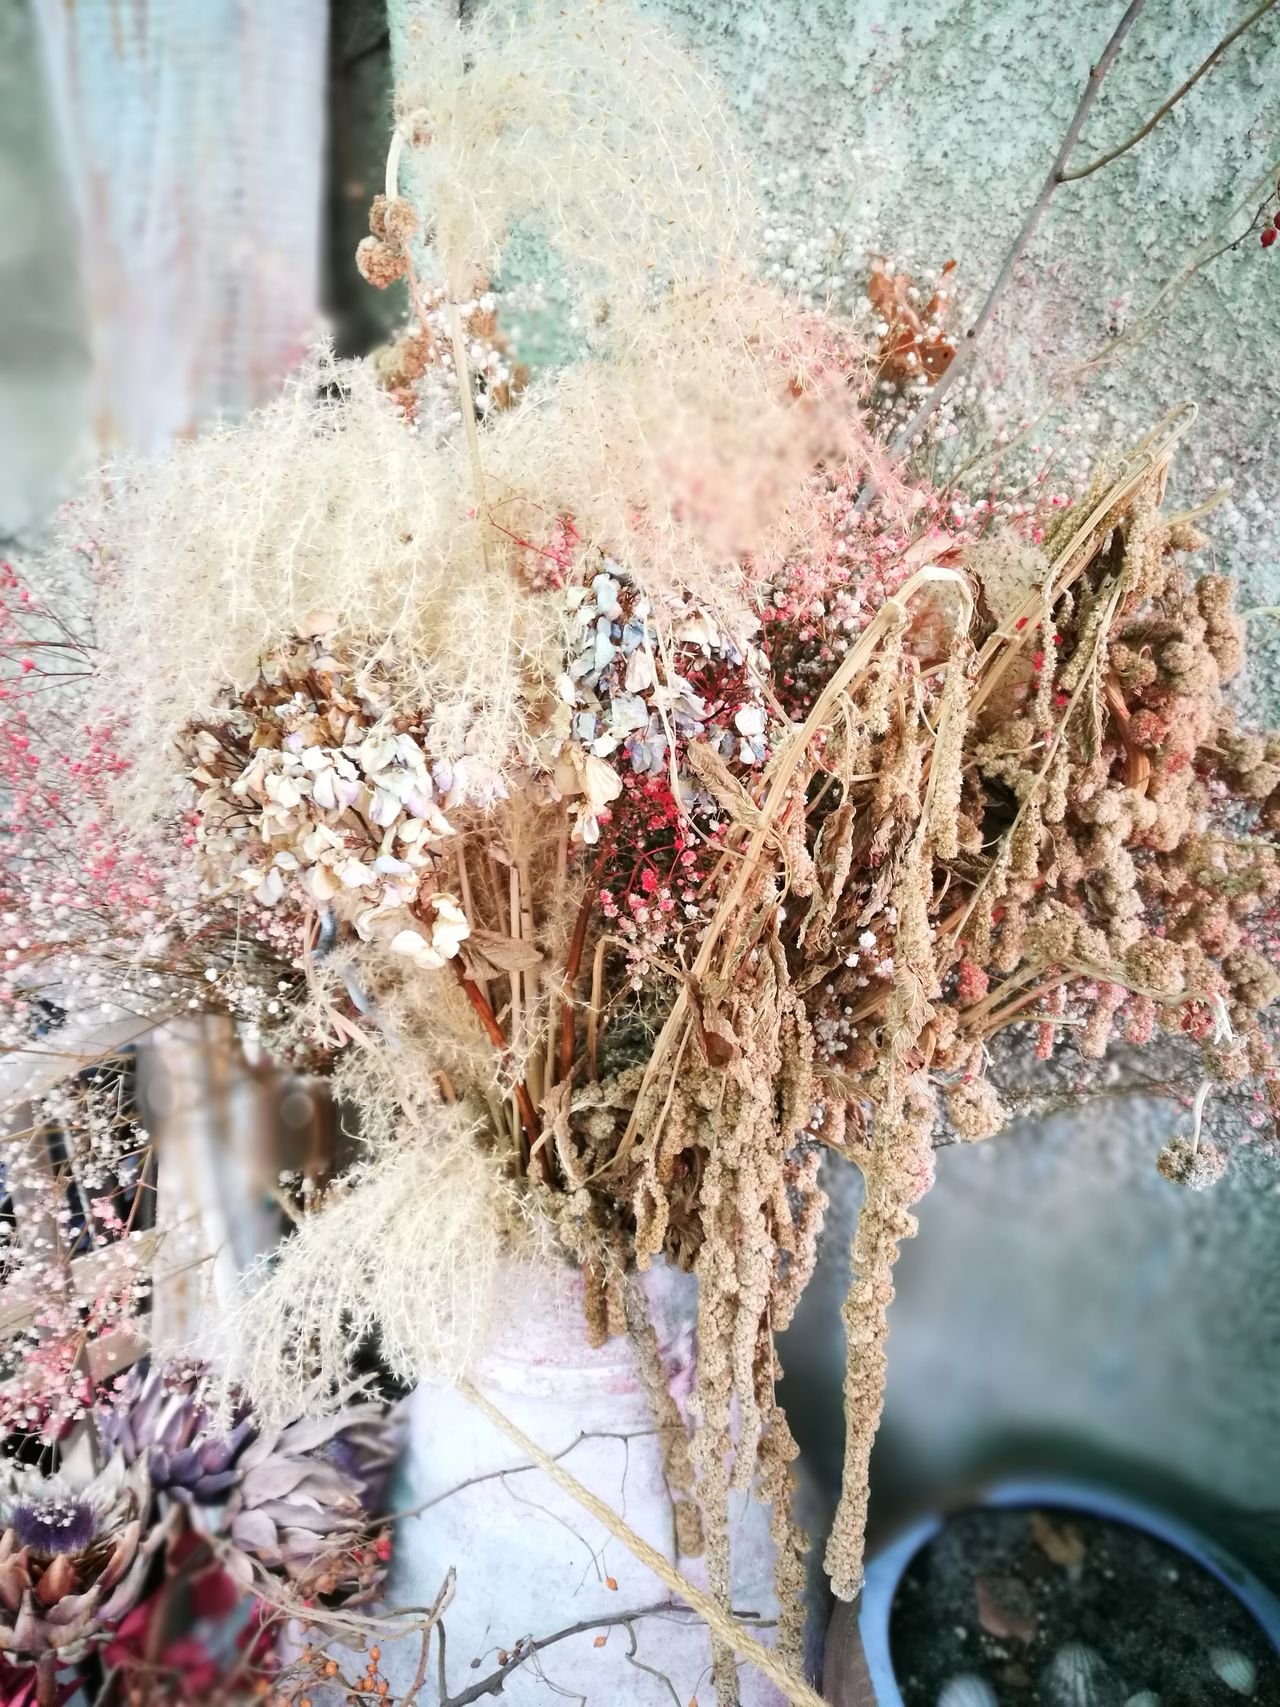 Nature Dried Flowers Forever Longlasting Flower Arangement nofilternoedit